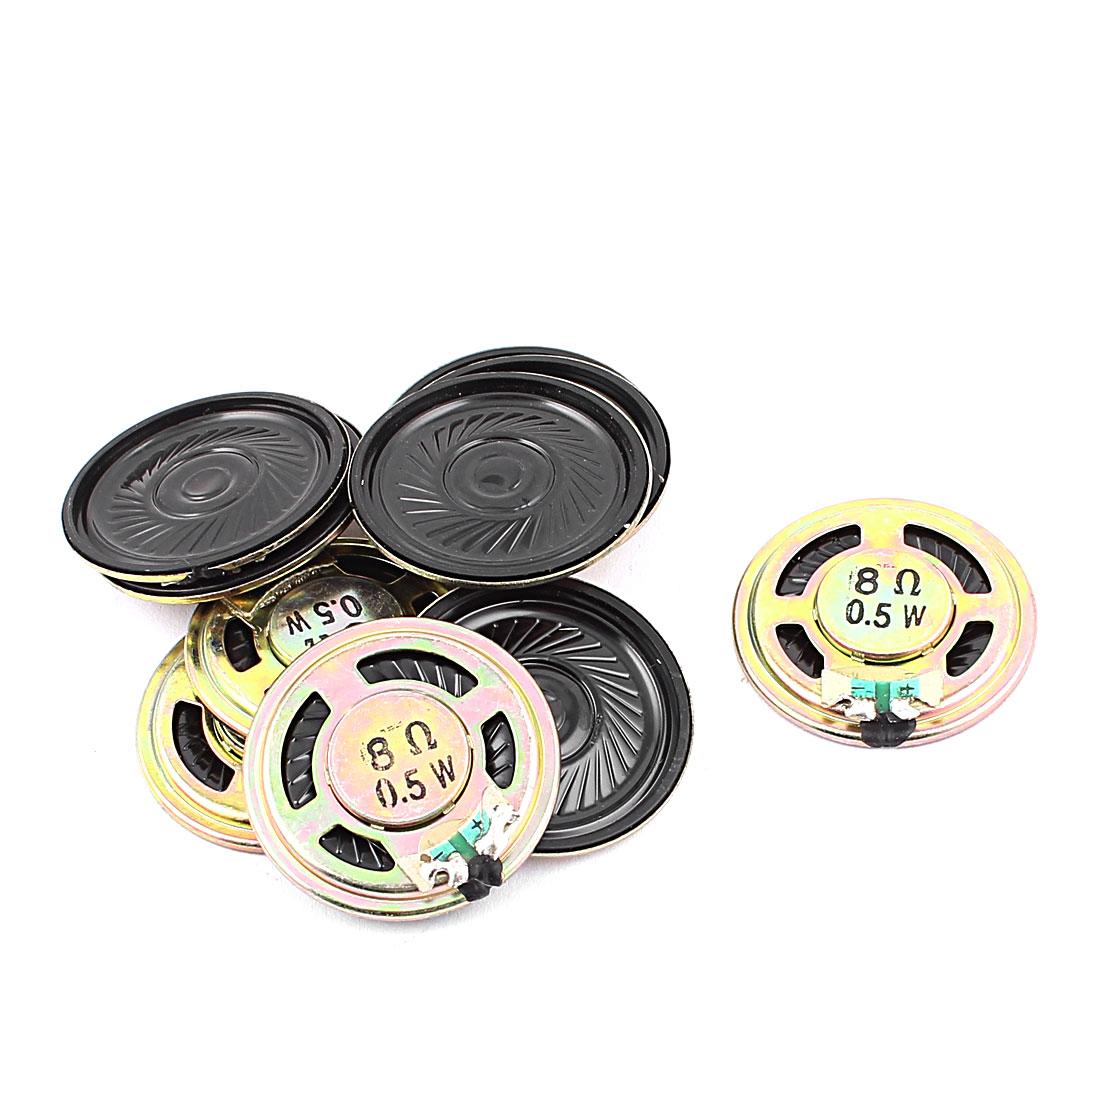 10 Pcs 36mm 8 Ohm 0.5W Metal External Magnetic Speaker Loudspeaker Gold Tone